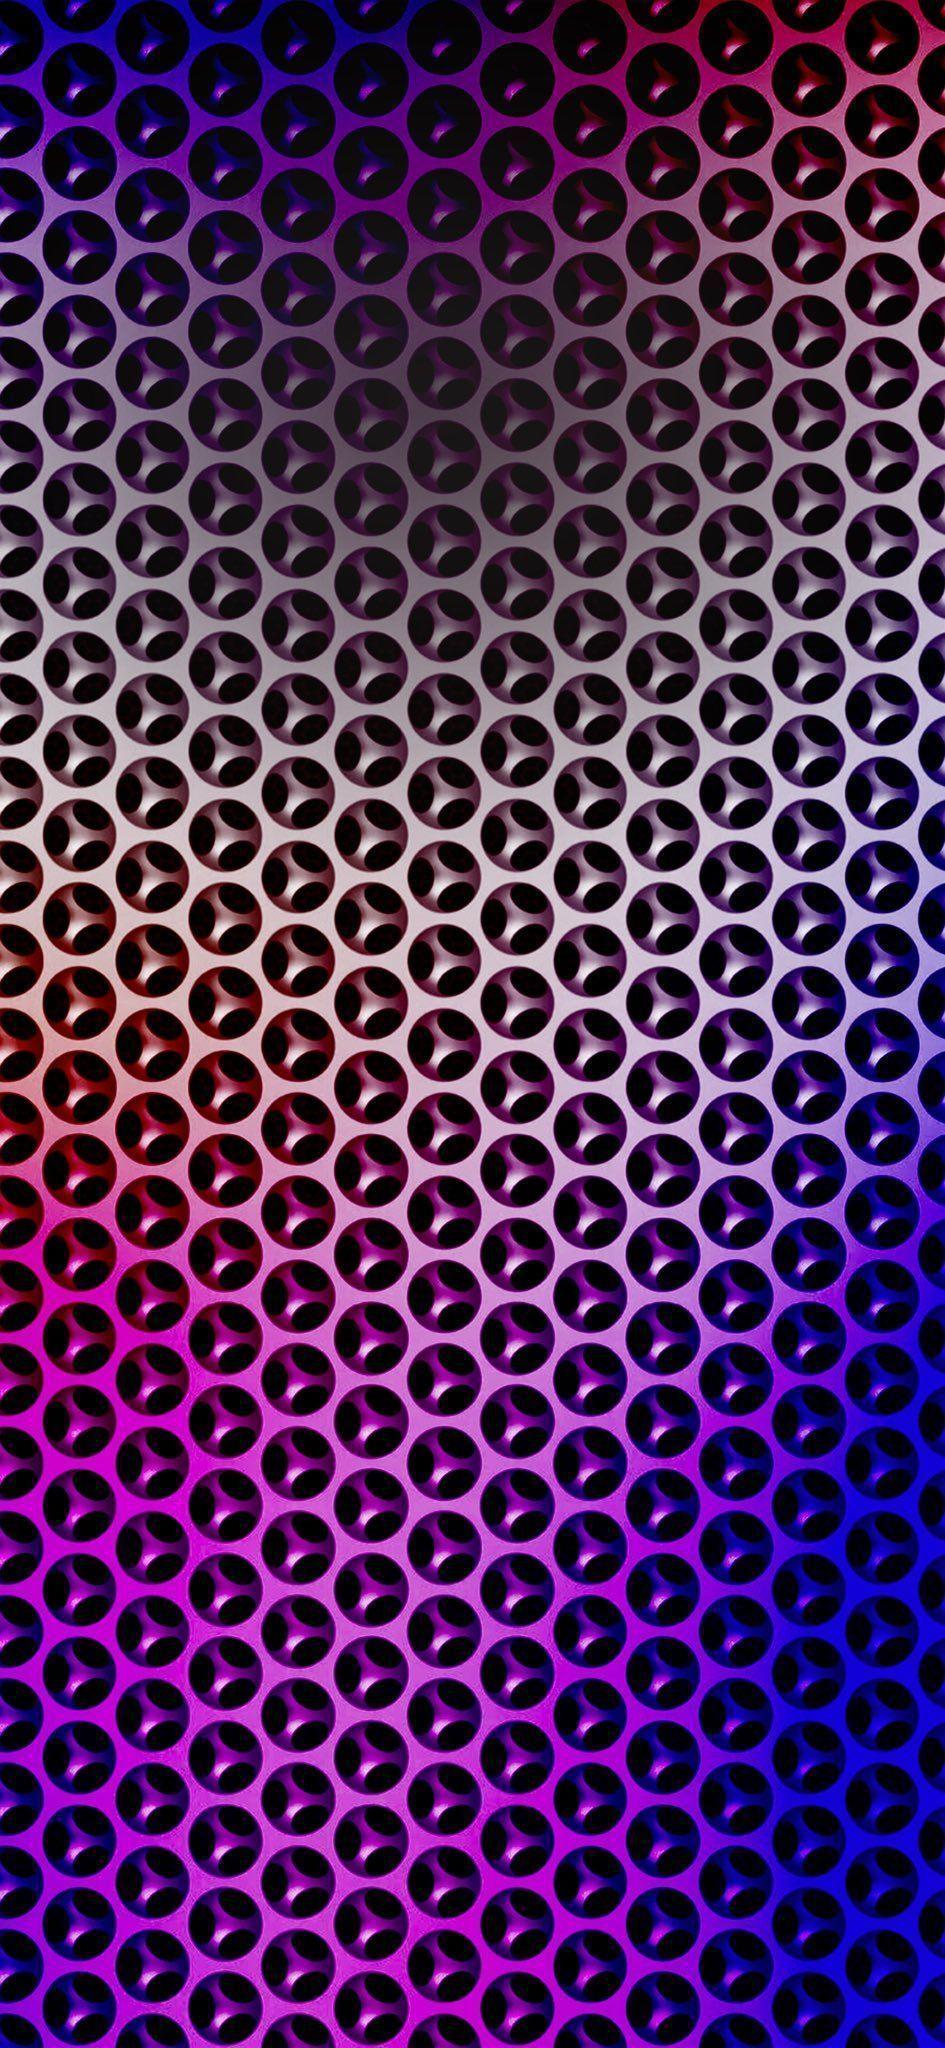 #iOS11 #iOS12 #iOS13 #Lockscreen #Homescreen #backgrounds #Apple #iPhone #iPad #iOS #wallpaper #iPhoneX #iPhoneXS #iPhoneXR #iPhoneXSMax #Mojave #Catalina #uidesign #backgrounds #Screenshot #Apple #iPhone #iPad #iOS #AndroidOS #widescreen #edge #desktop #themes #followme #background #follow #random #xs #xsmax #design #wallpapers #oled #amoled #wwdc #ios13wallpaper #iOS11 #iOS12 #iOS13 #Lockscreen #Homescreen #backgrounds #Apple #iPhone #iPad #iOS #wallpaper #iPhoneX #iPhoneXS #iPhoneXR #iPhoneXS #ios13wallpaper